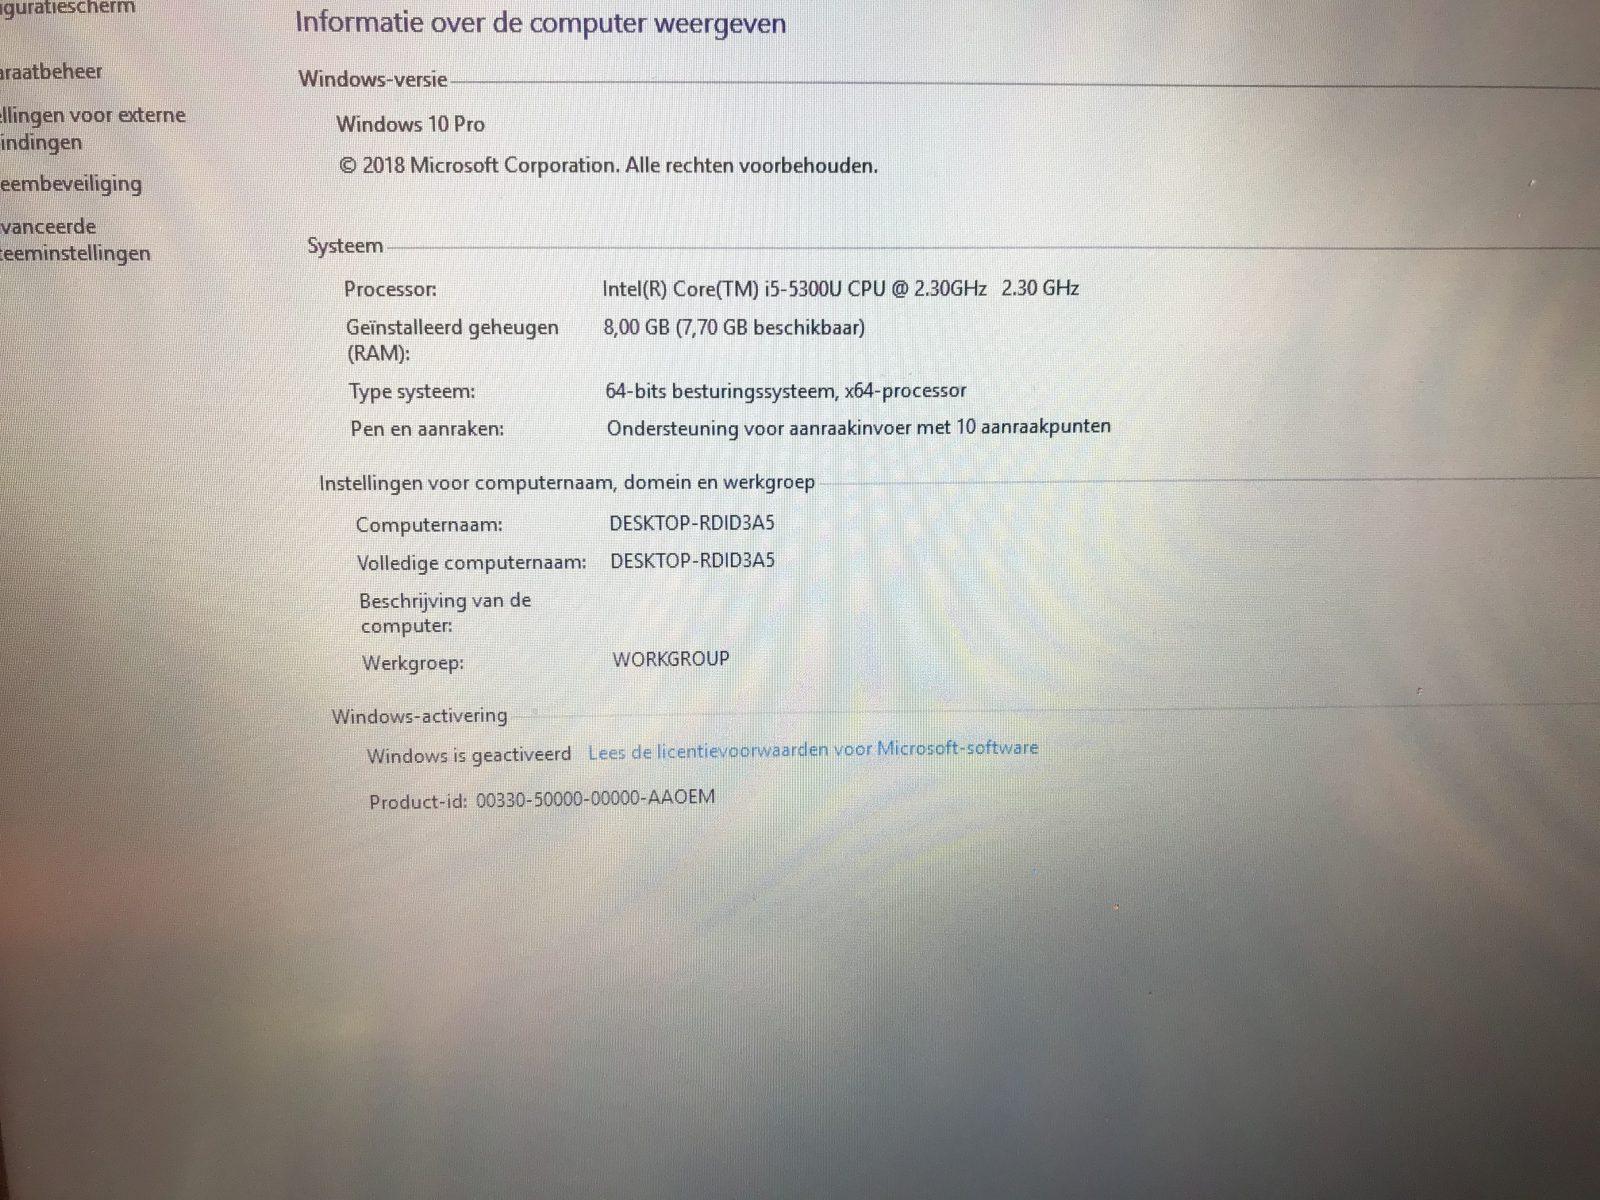 Lenovo Thinkpad T450 i5 5300 8gb 256gb ssd 14 inch IPS Touch